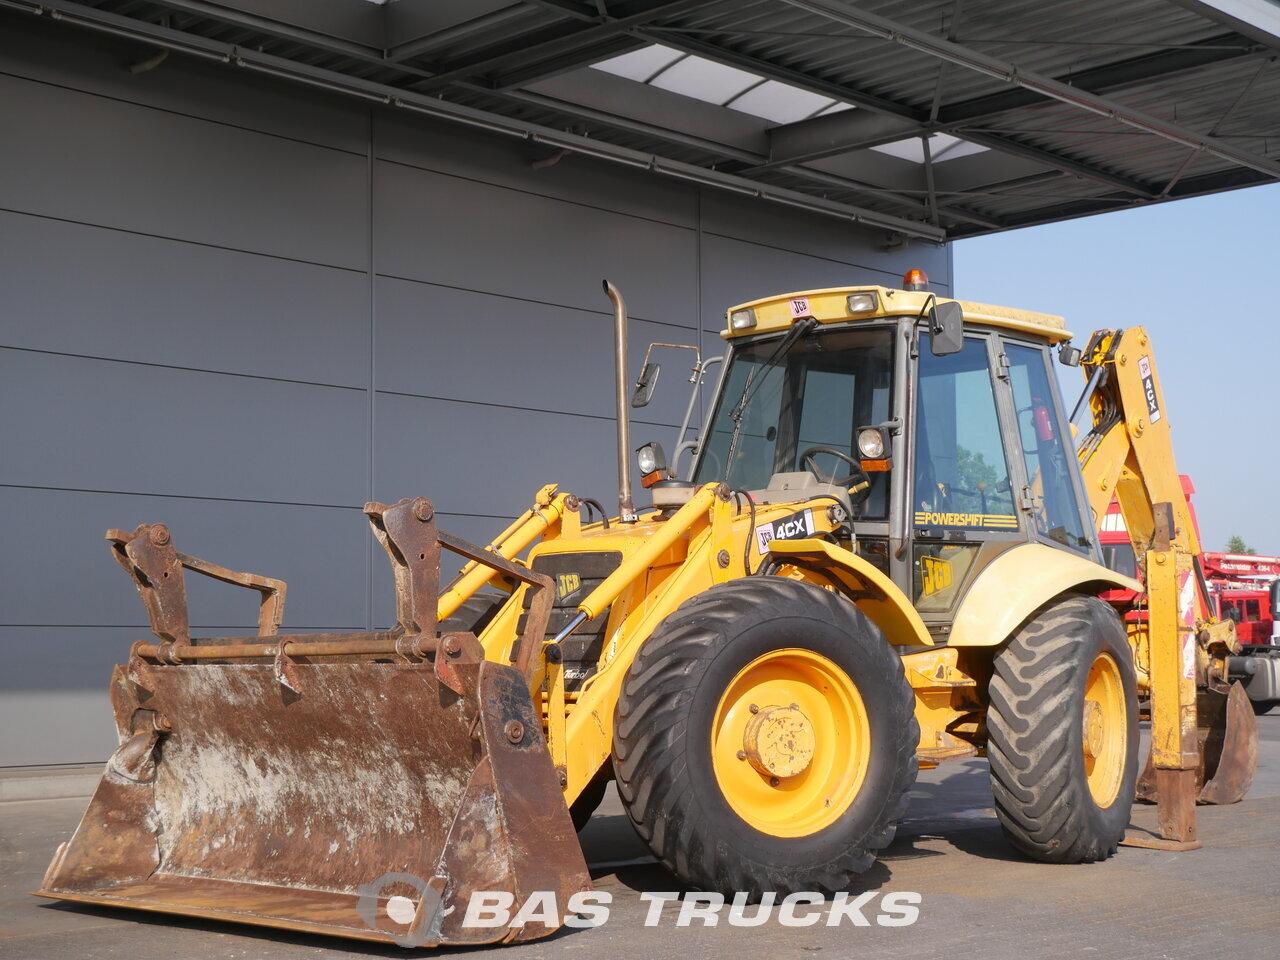 Jcb 4cx Construction Equipment 18200 Bas Machinery Fuse Box Location Photo Of Used 4x4 1998